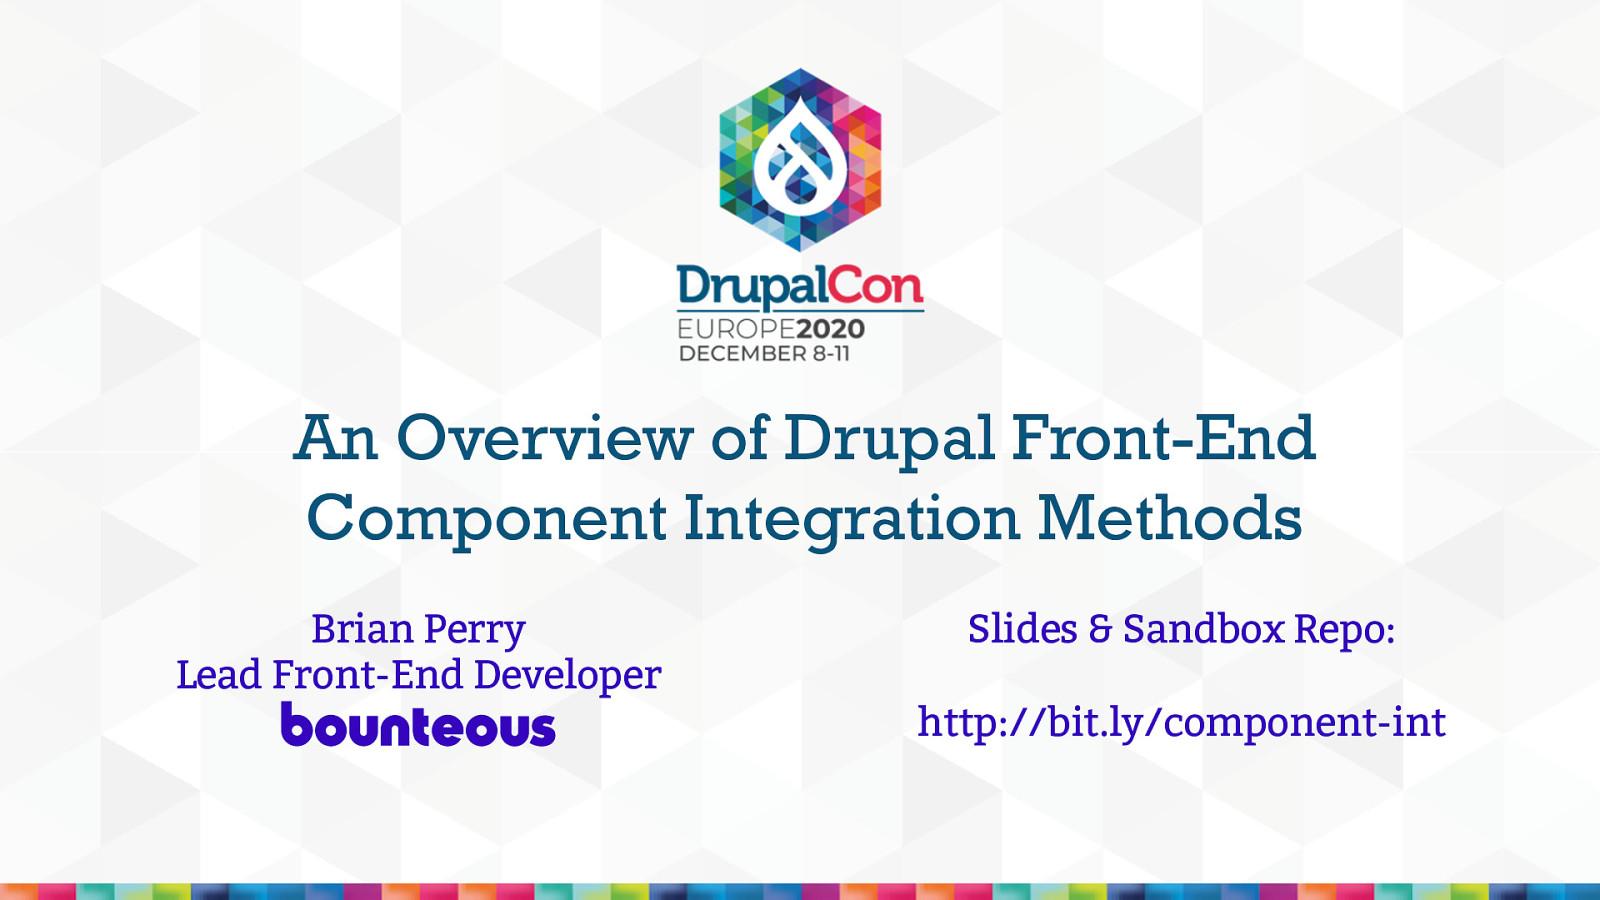 An Overview of Drupal Front-End Component Integration Methods